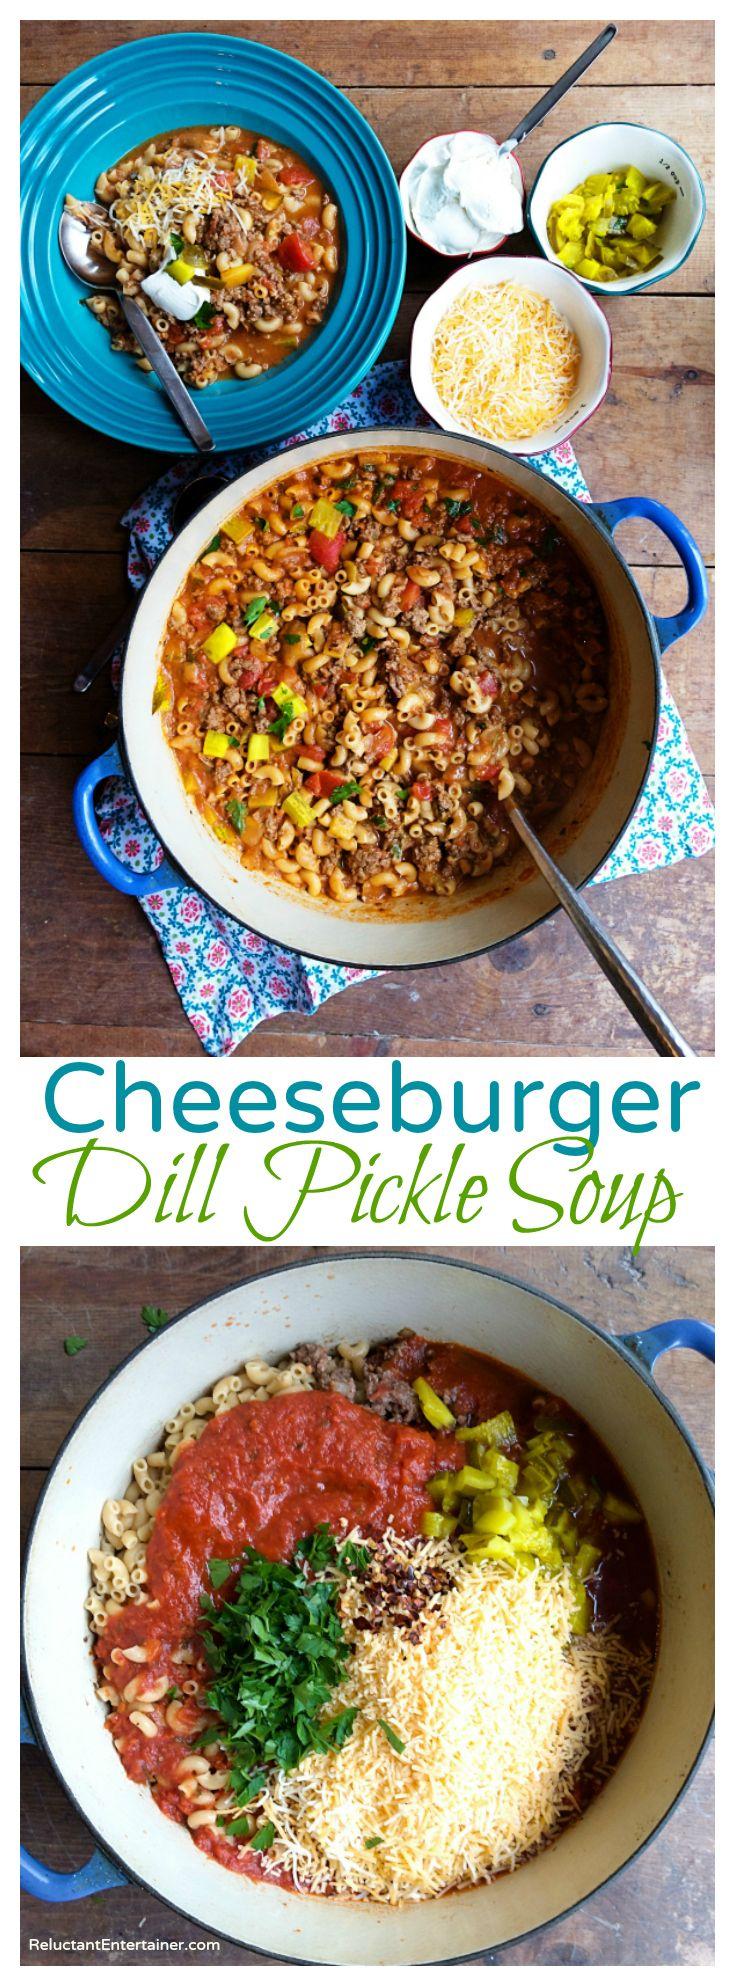 Cheeseburger Dill Pickle Soup Recipe